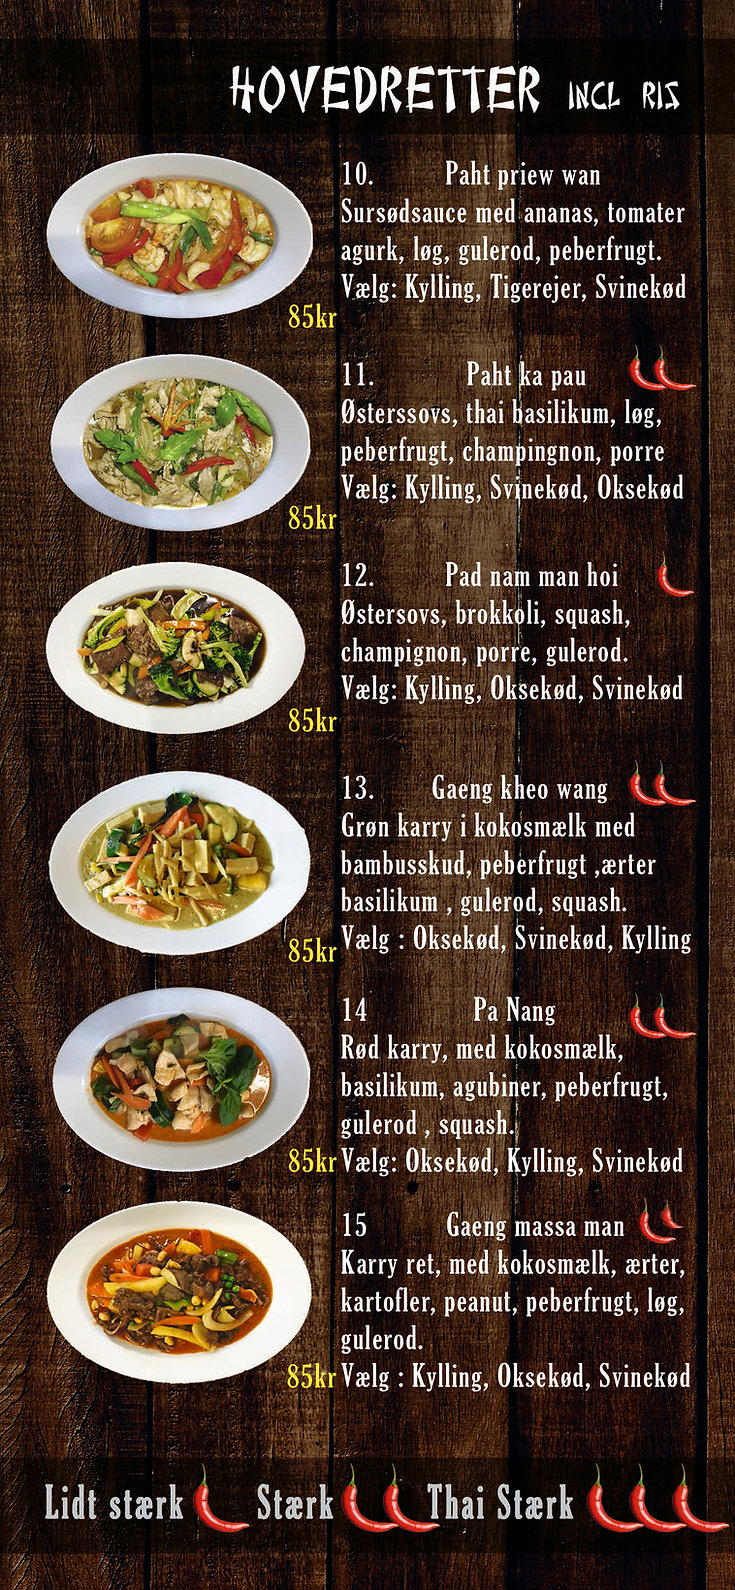 thai mekort back14-11-18 print ret 10-15